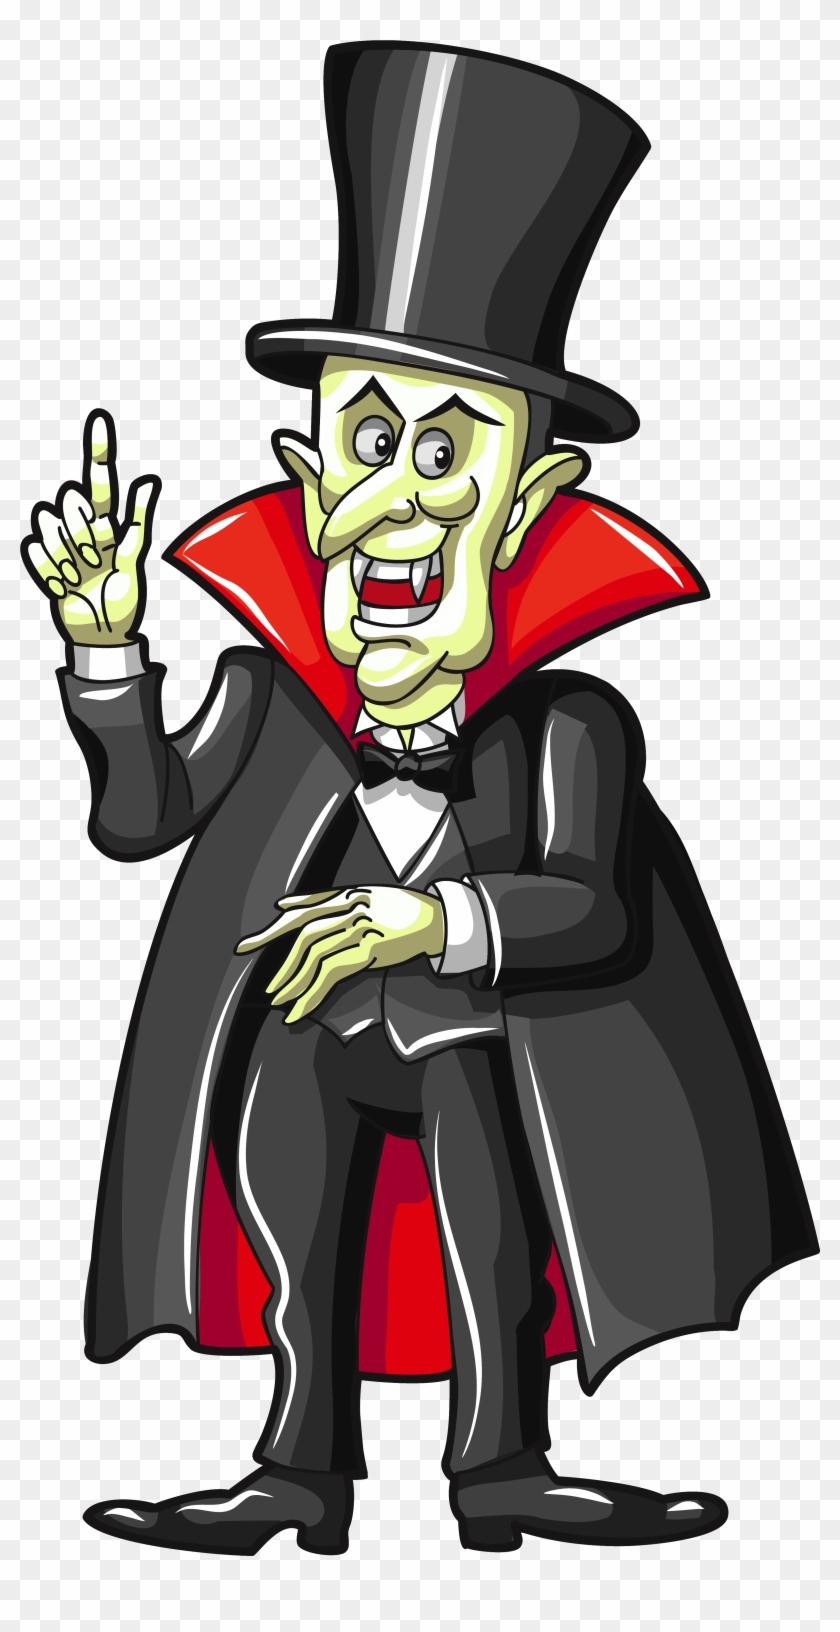 Haunted Clipart Halloween Vampire - Halloween Vampire Clipart #171240